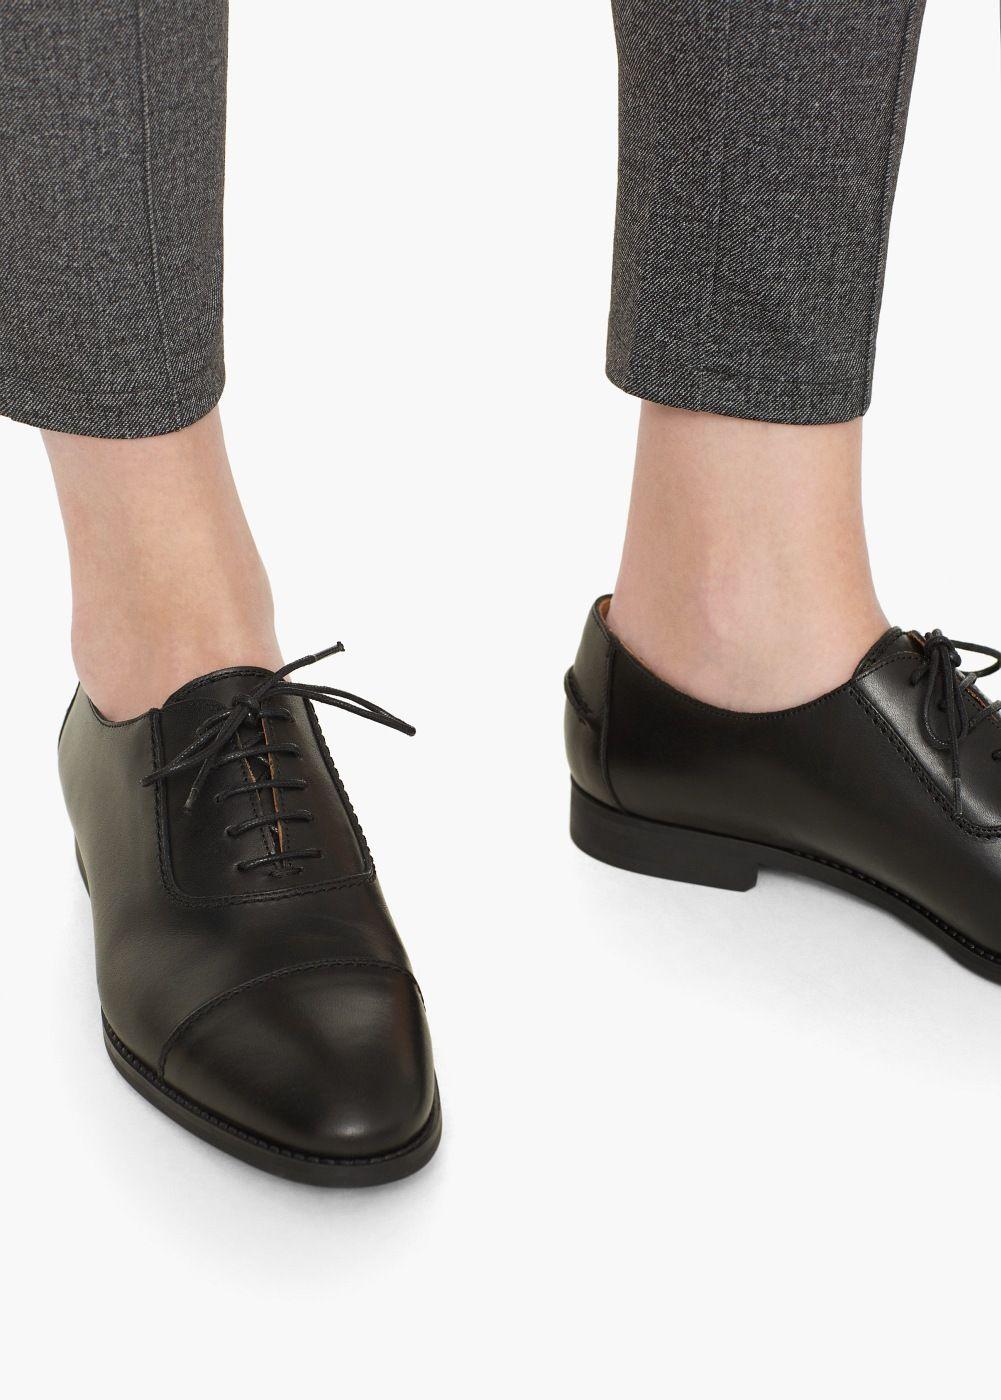 online store 5f82b c12c0 Oxford-schuh aus leder - Damen | Schuhe | Oxford schuh ...